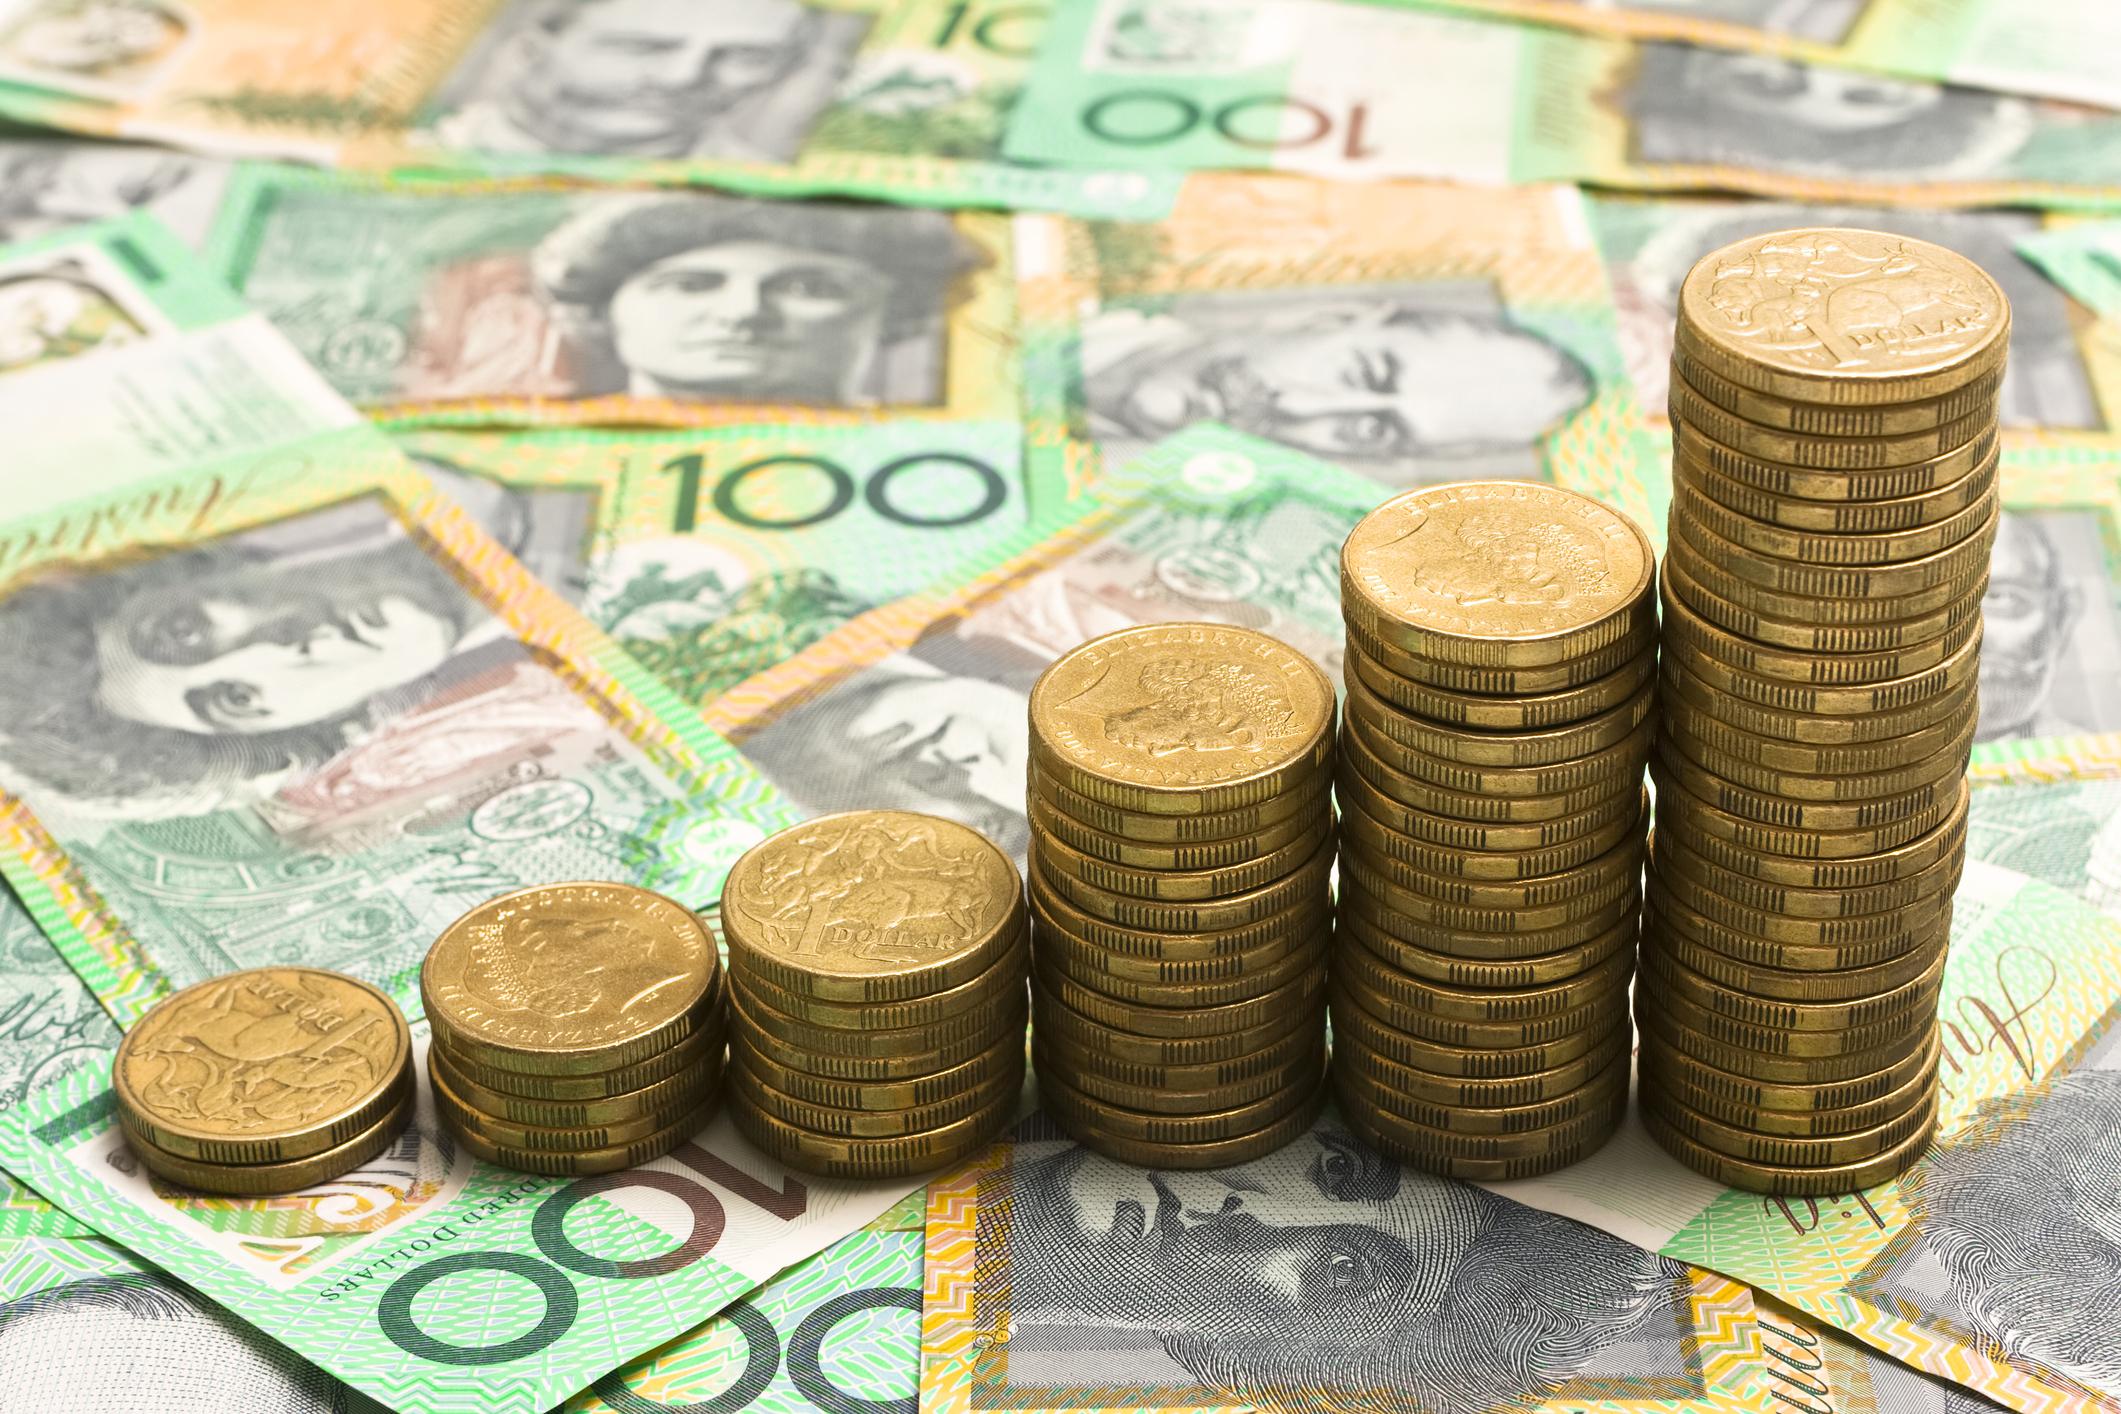 'It's not enough': Leading economist calls for billions more in stimulus